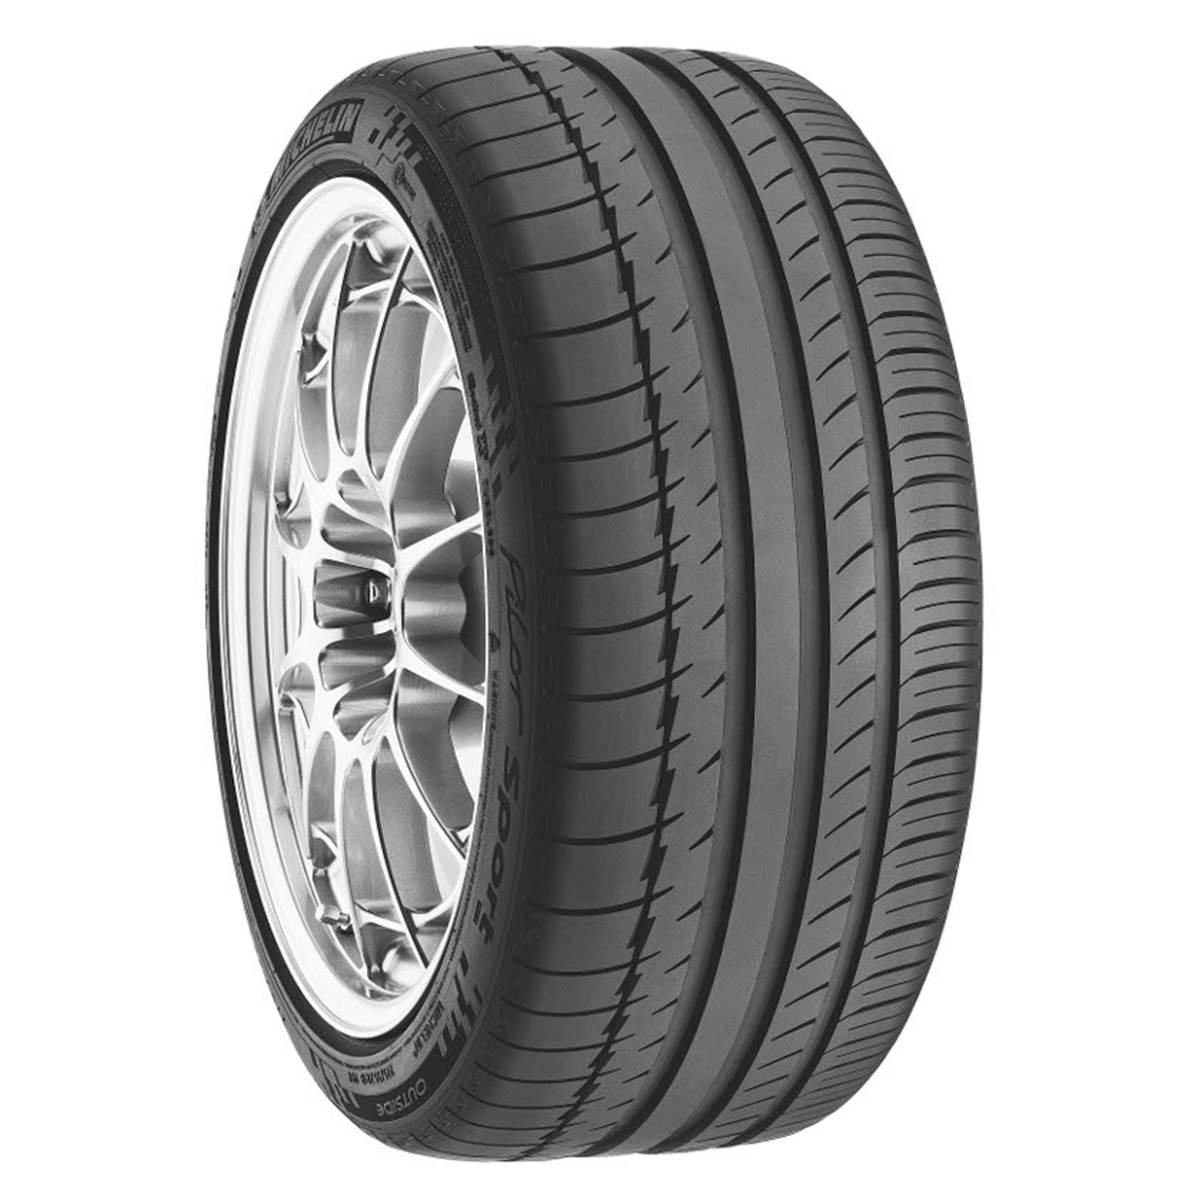 Pneu Michelin 265/35R18 97Y Pilot Sport Ps2 XL